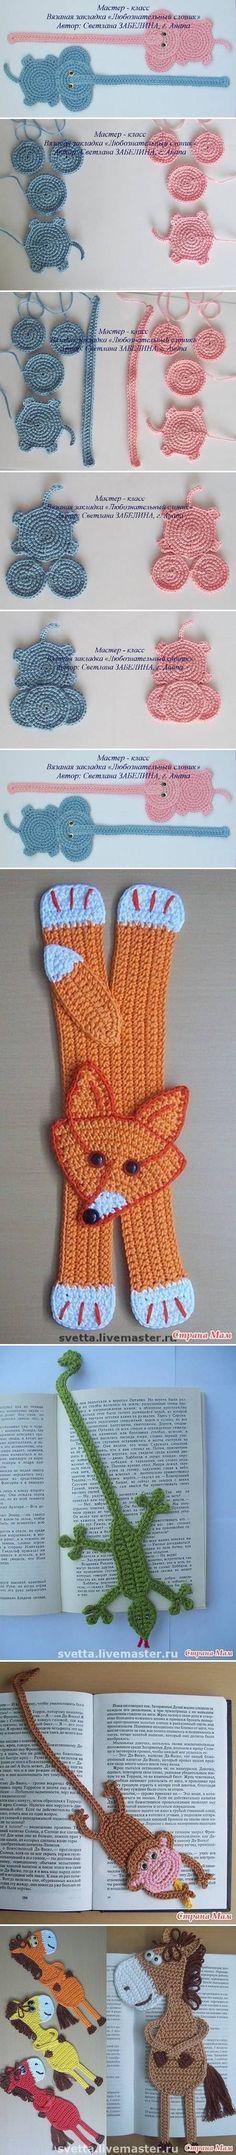 DIY Crochet Elephant Bookmark DIY Projects | UsefulDIY.com fox, crocheted animals, crochet animals, crochet eleph, crochet bookmarks, craft ideas, diy projects, crafts, eleph bookmark